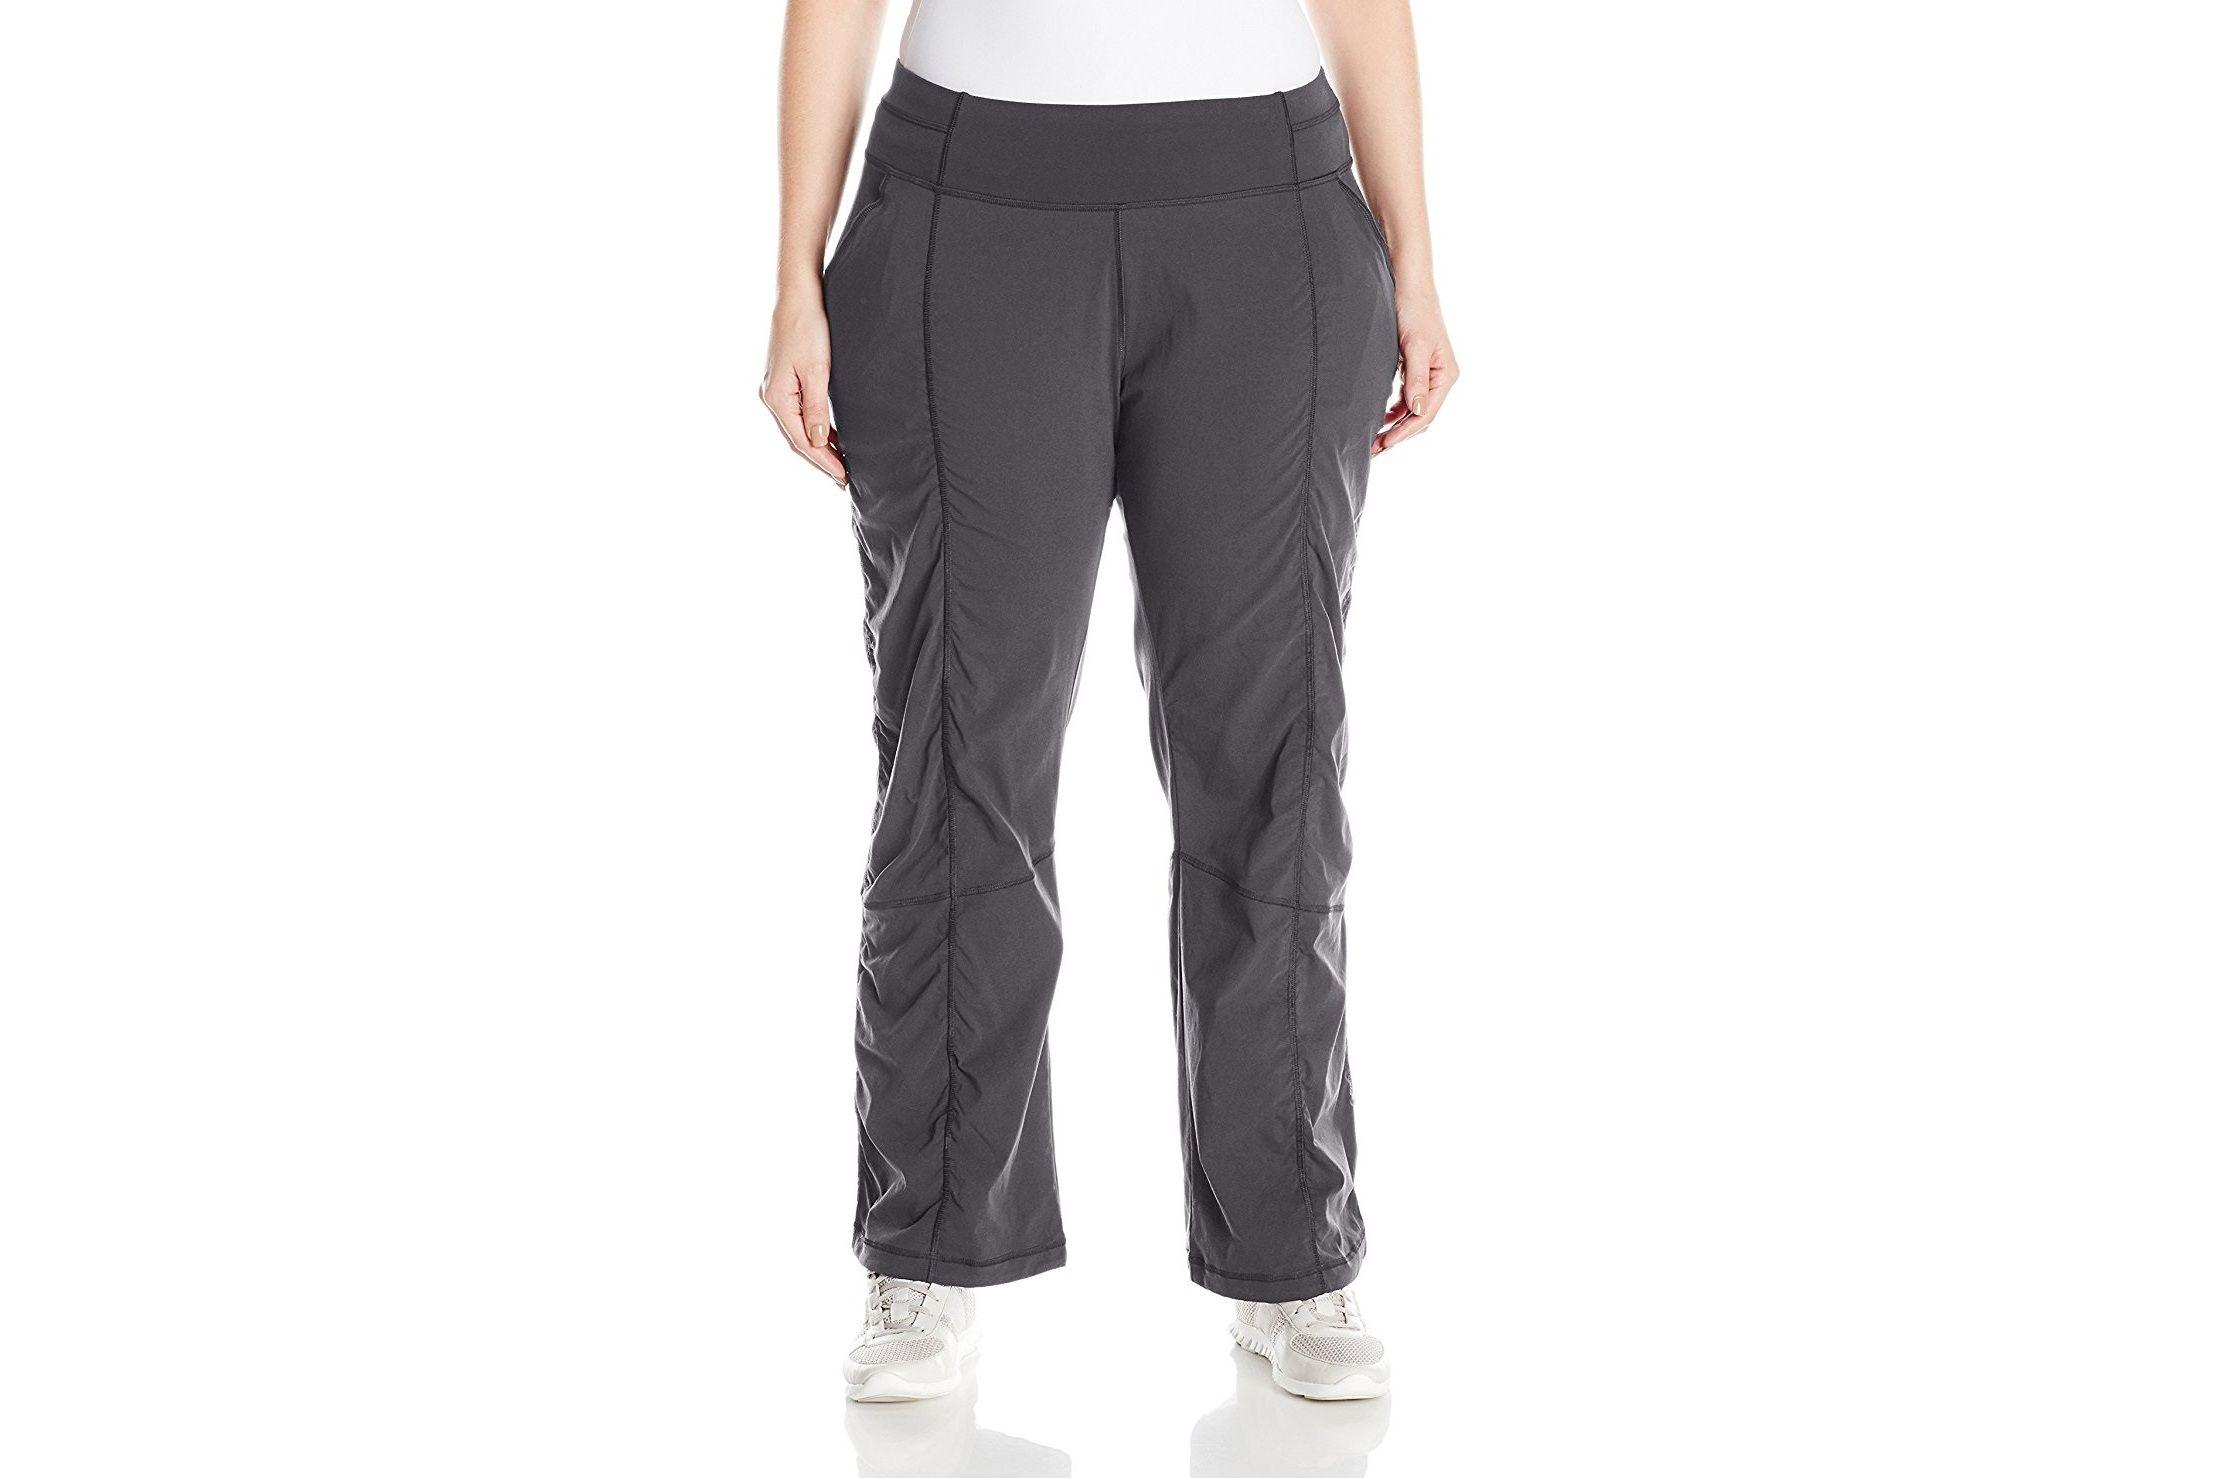 f4562f790bbf8 Plus Size Walking Pants for Women to Buy in 2019